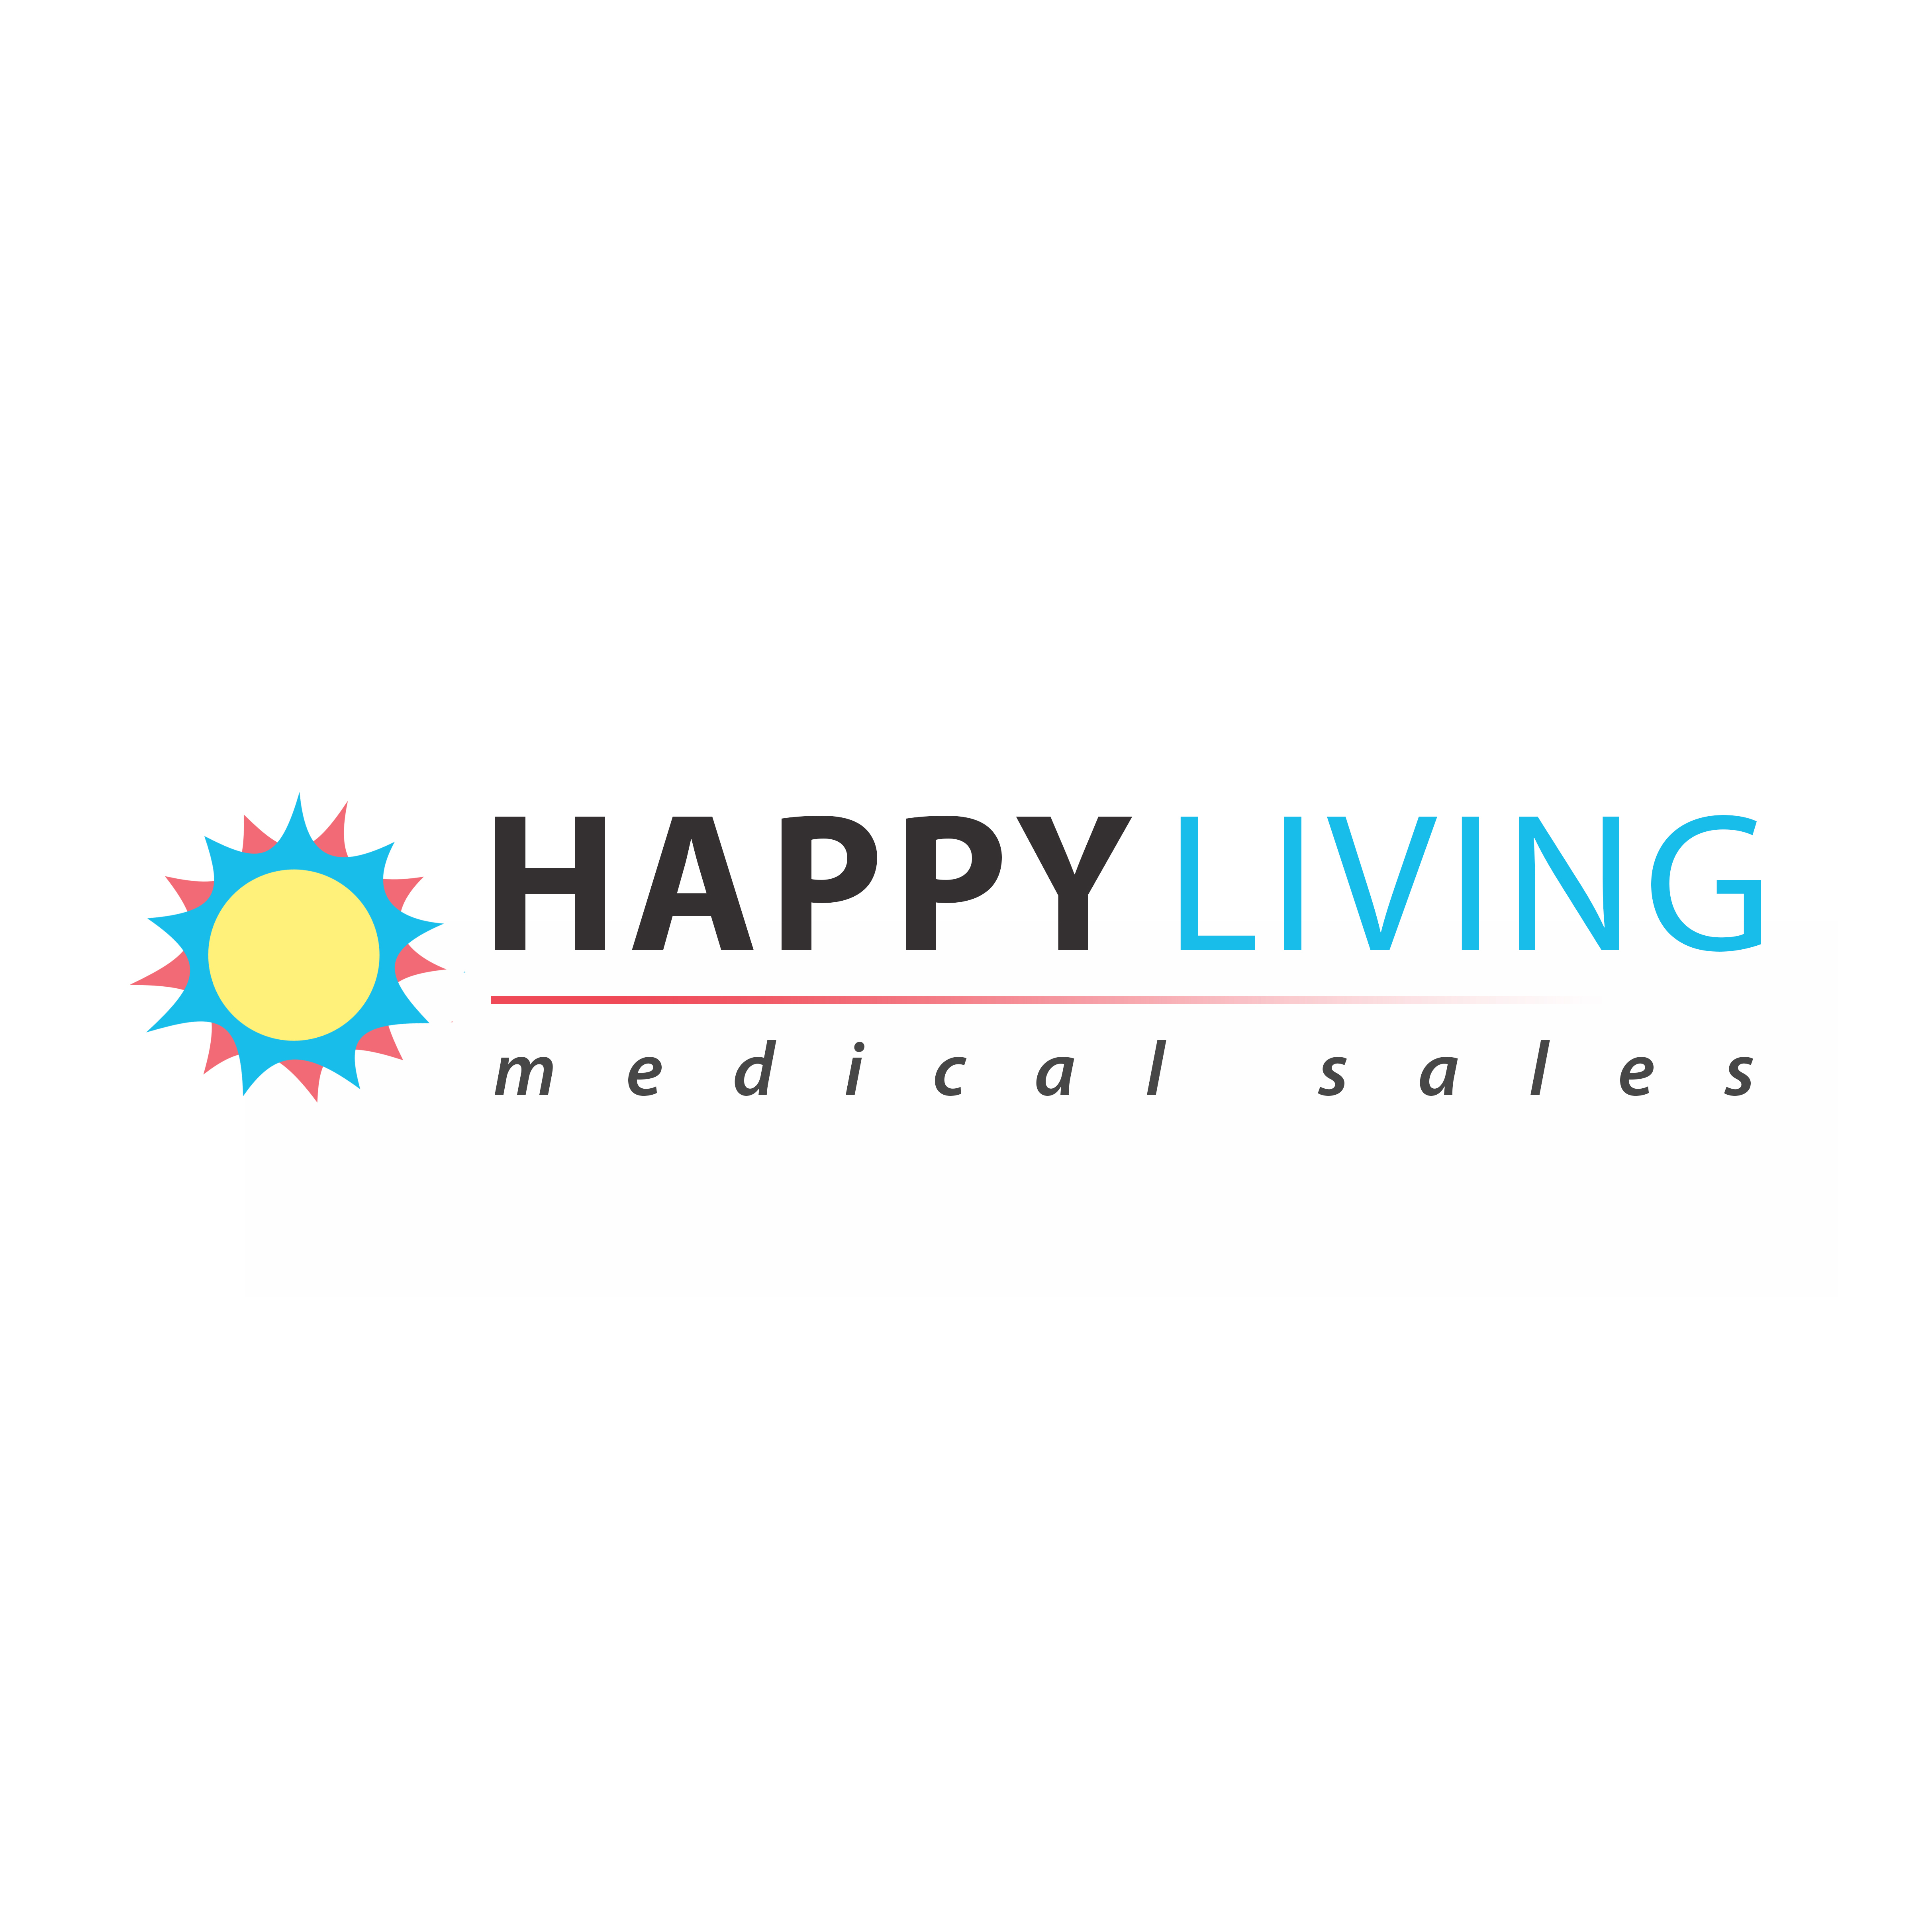 Happy Living Medical Sales